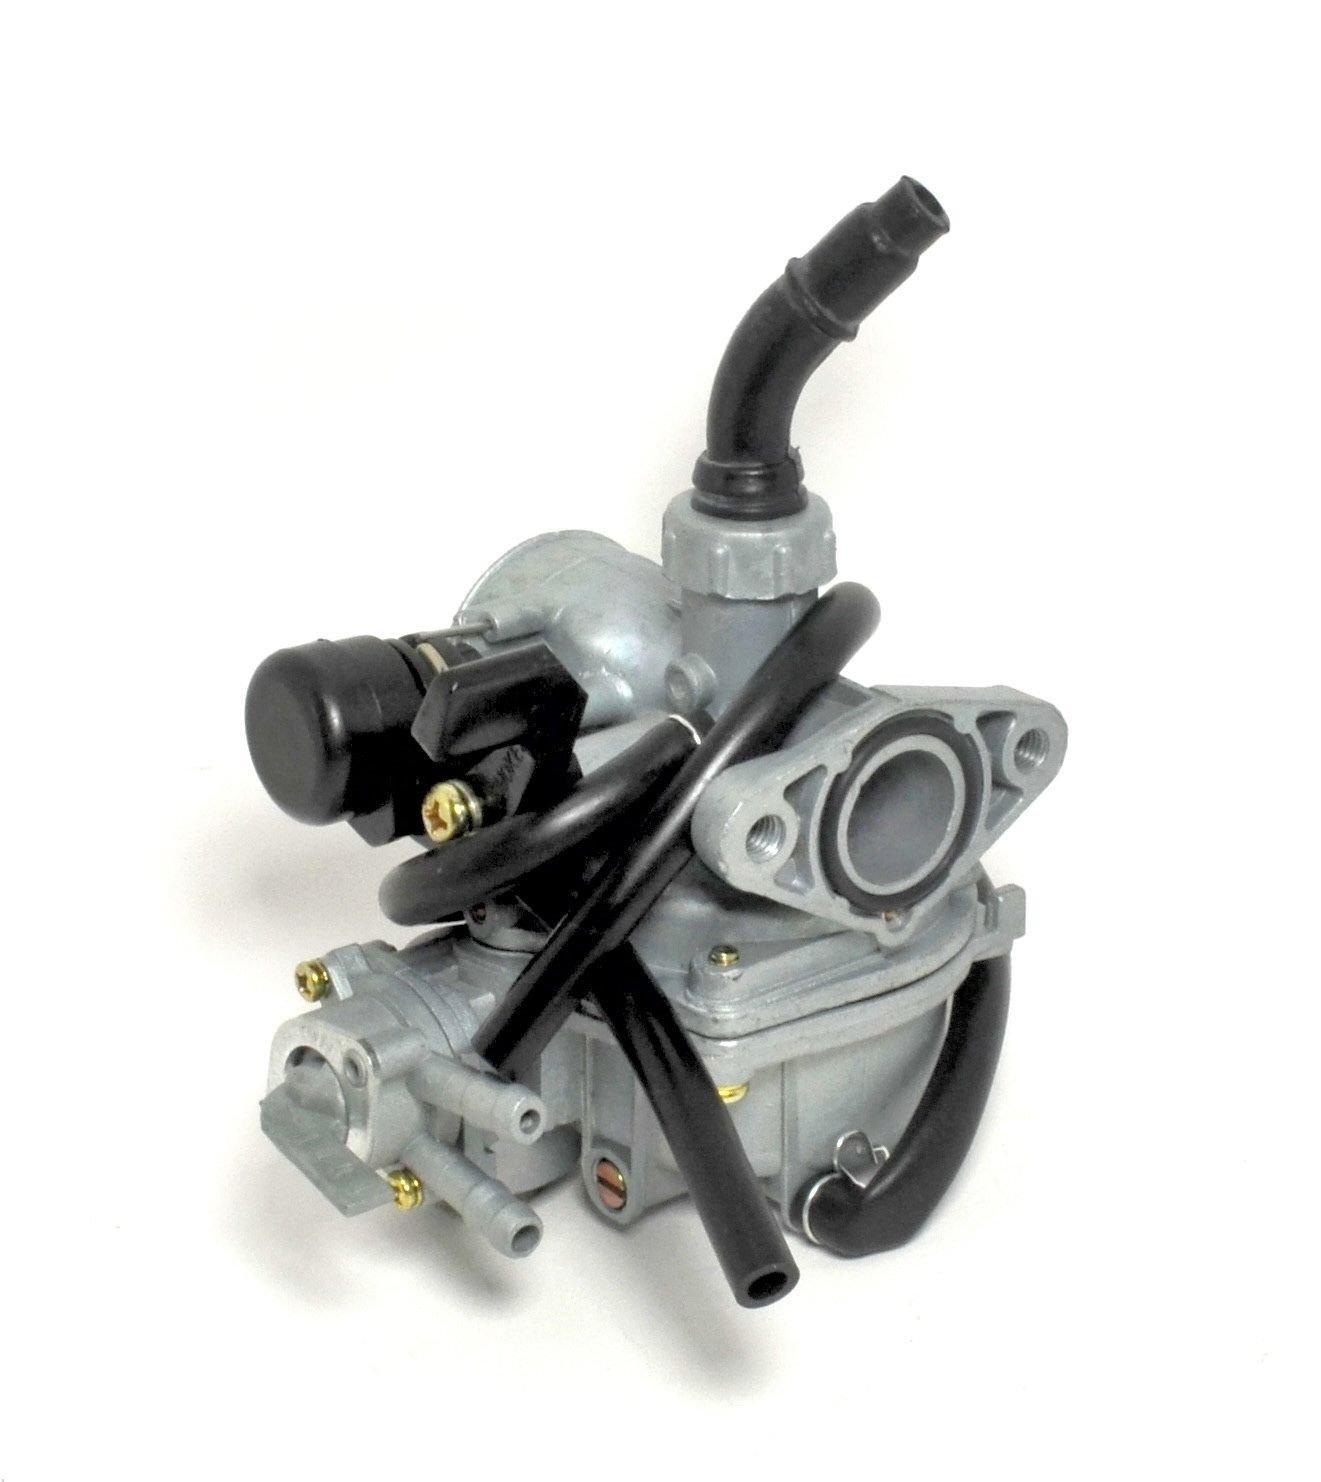 Carburetor Carb For Honda Ct70 St70 Ct90 St90 Mini Bike 1970 Valve Guide 1968 1982 Automotive